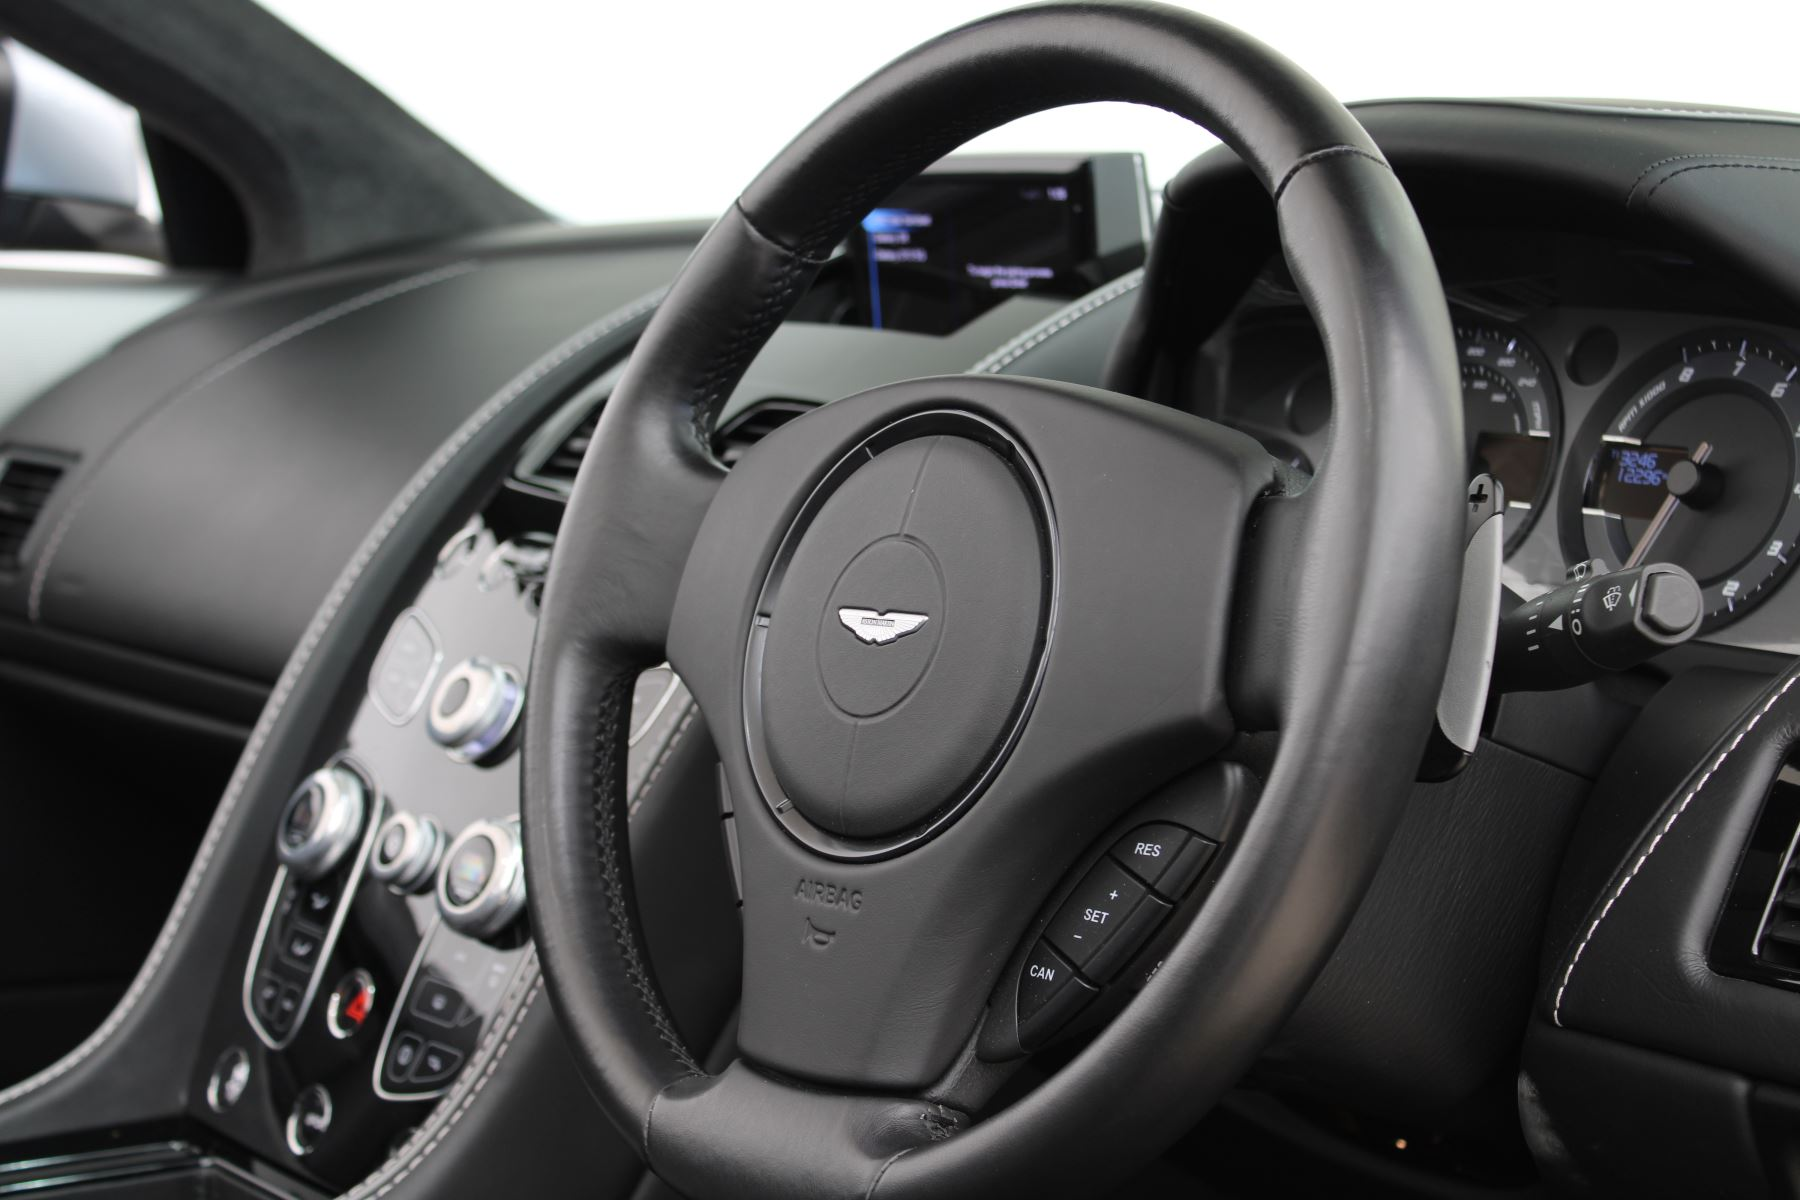 Aston Martin DB9 V12 GT 2dr Volante Skyfall Silver image 6